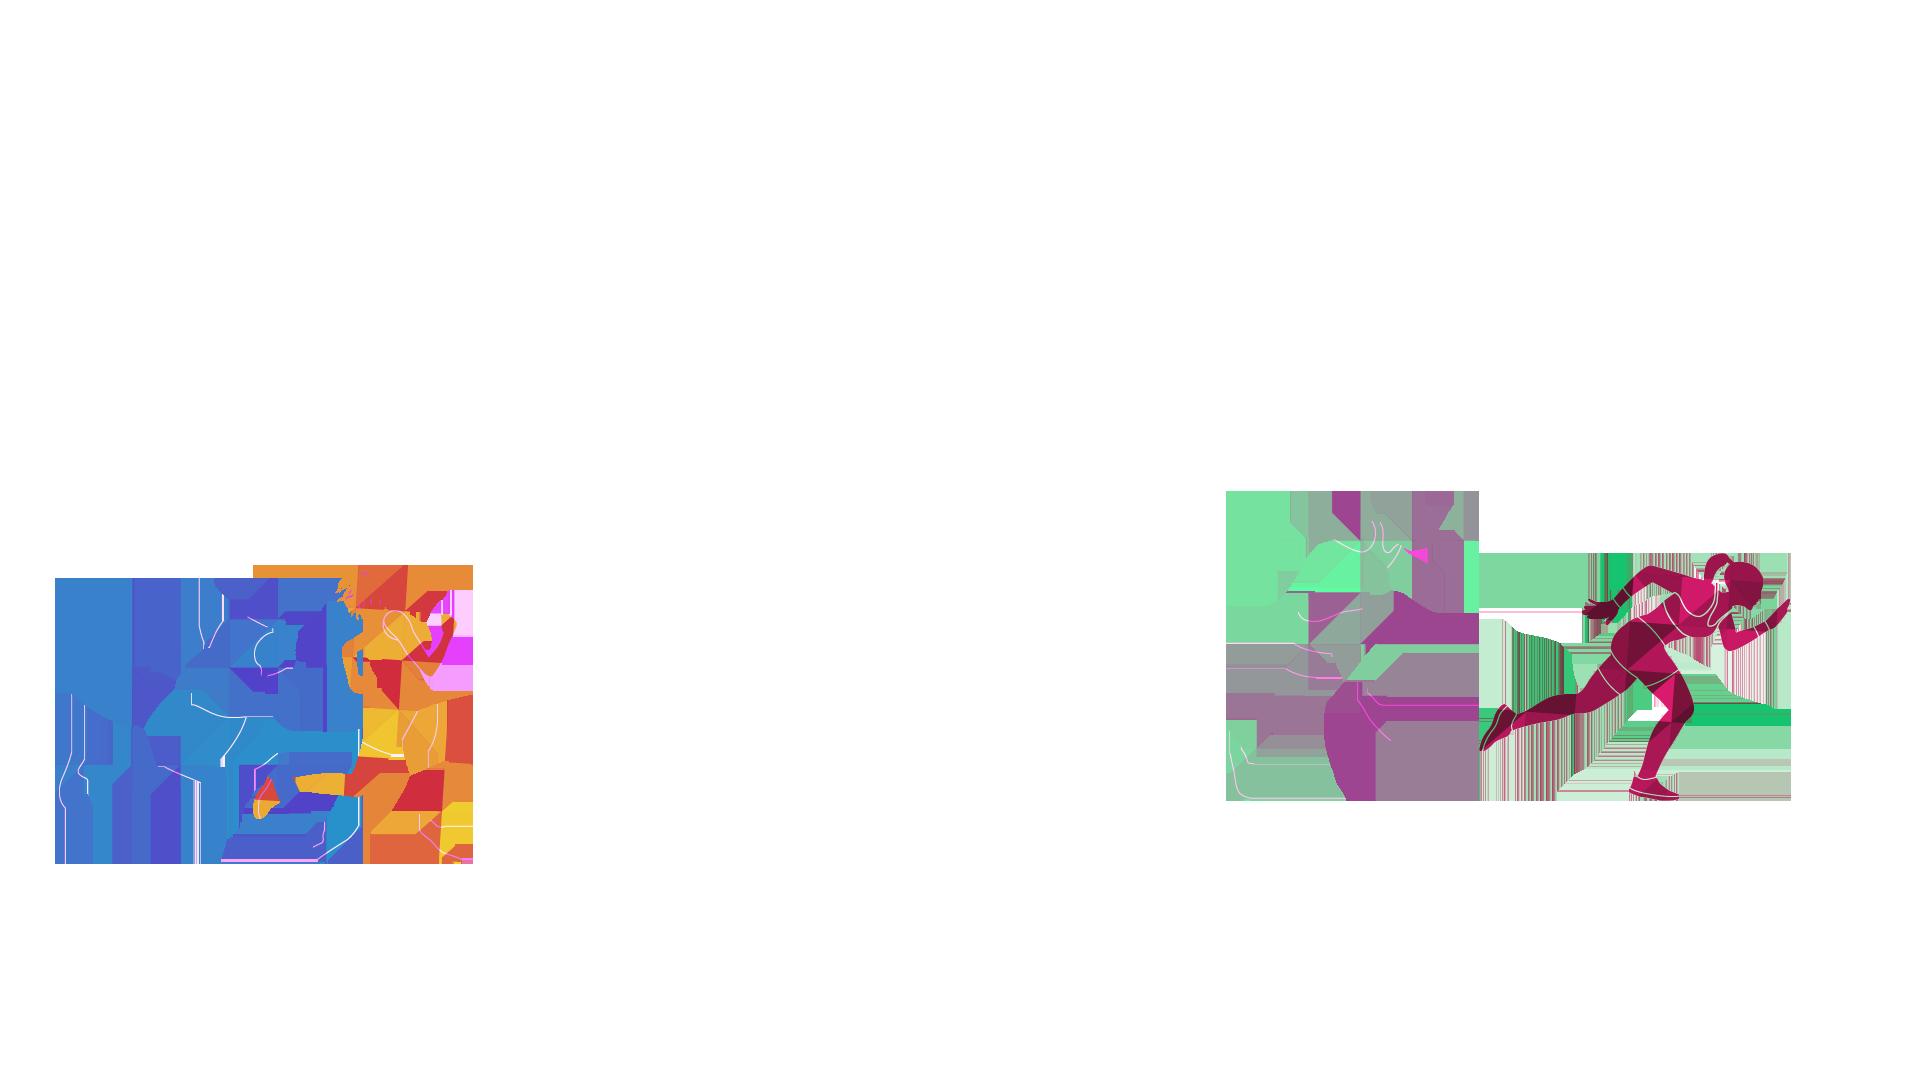 Corre rojo